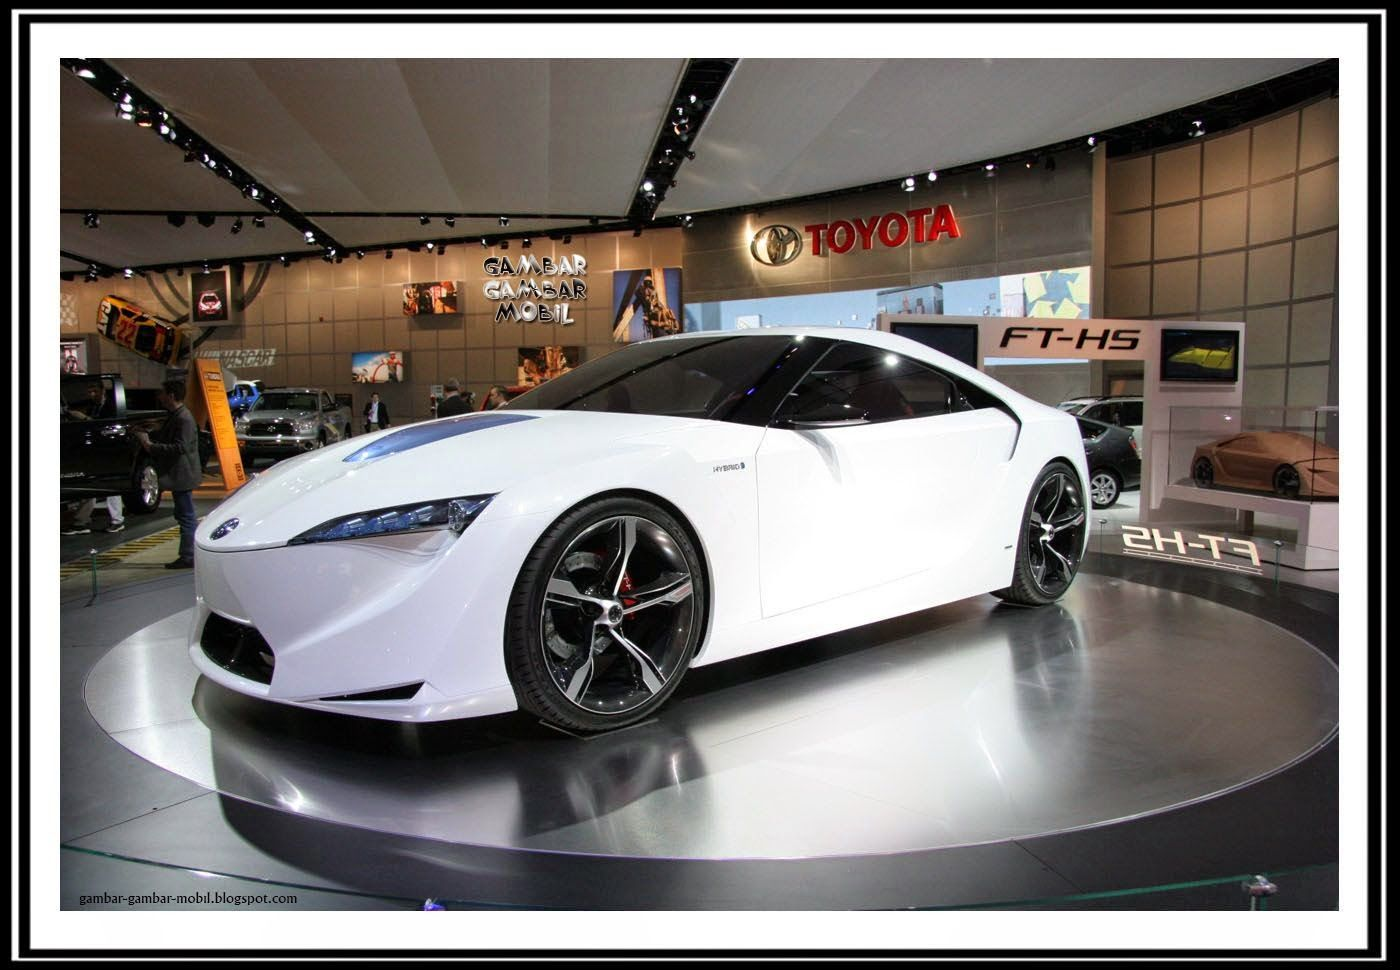 Gambar Mobil Toyota Gambar Gambar Mobil Toyota Supra Toyota Mobil